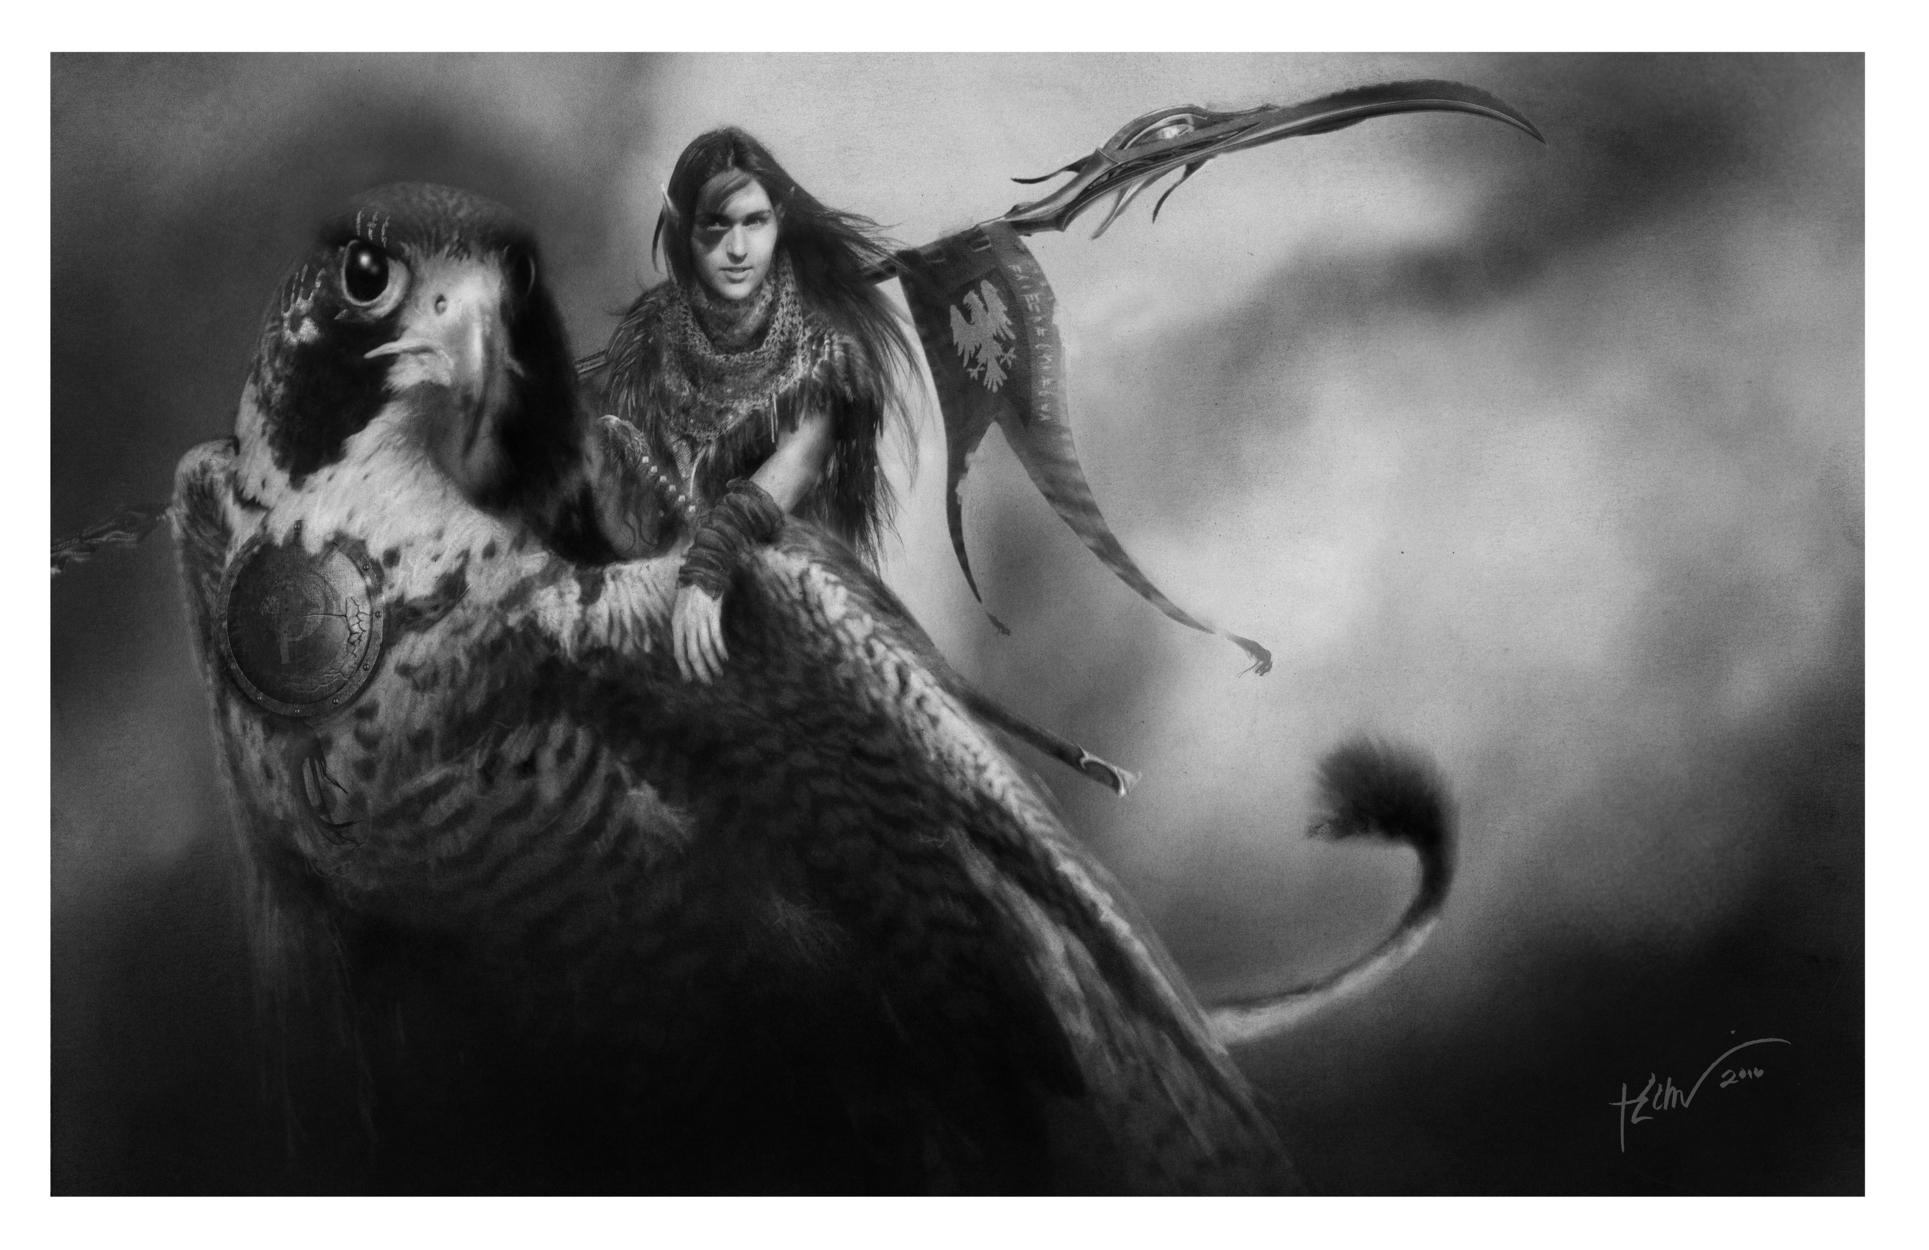 TAHLON WYNNE Artwork by Jeff Echevarria